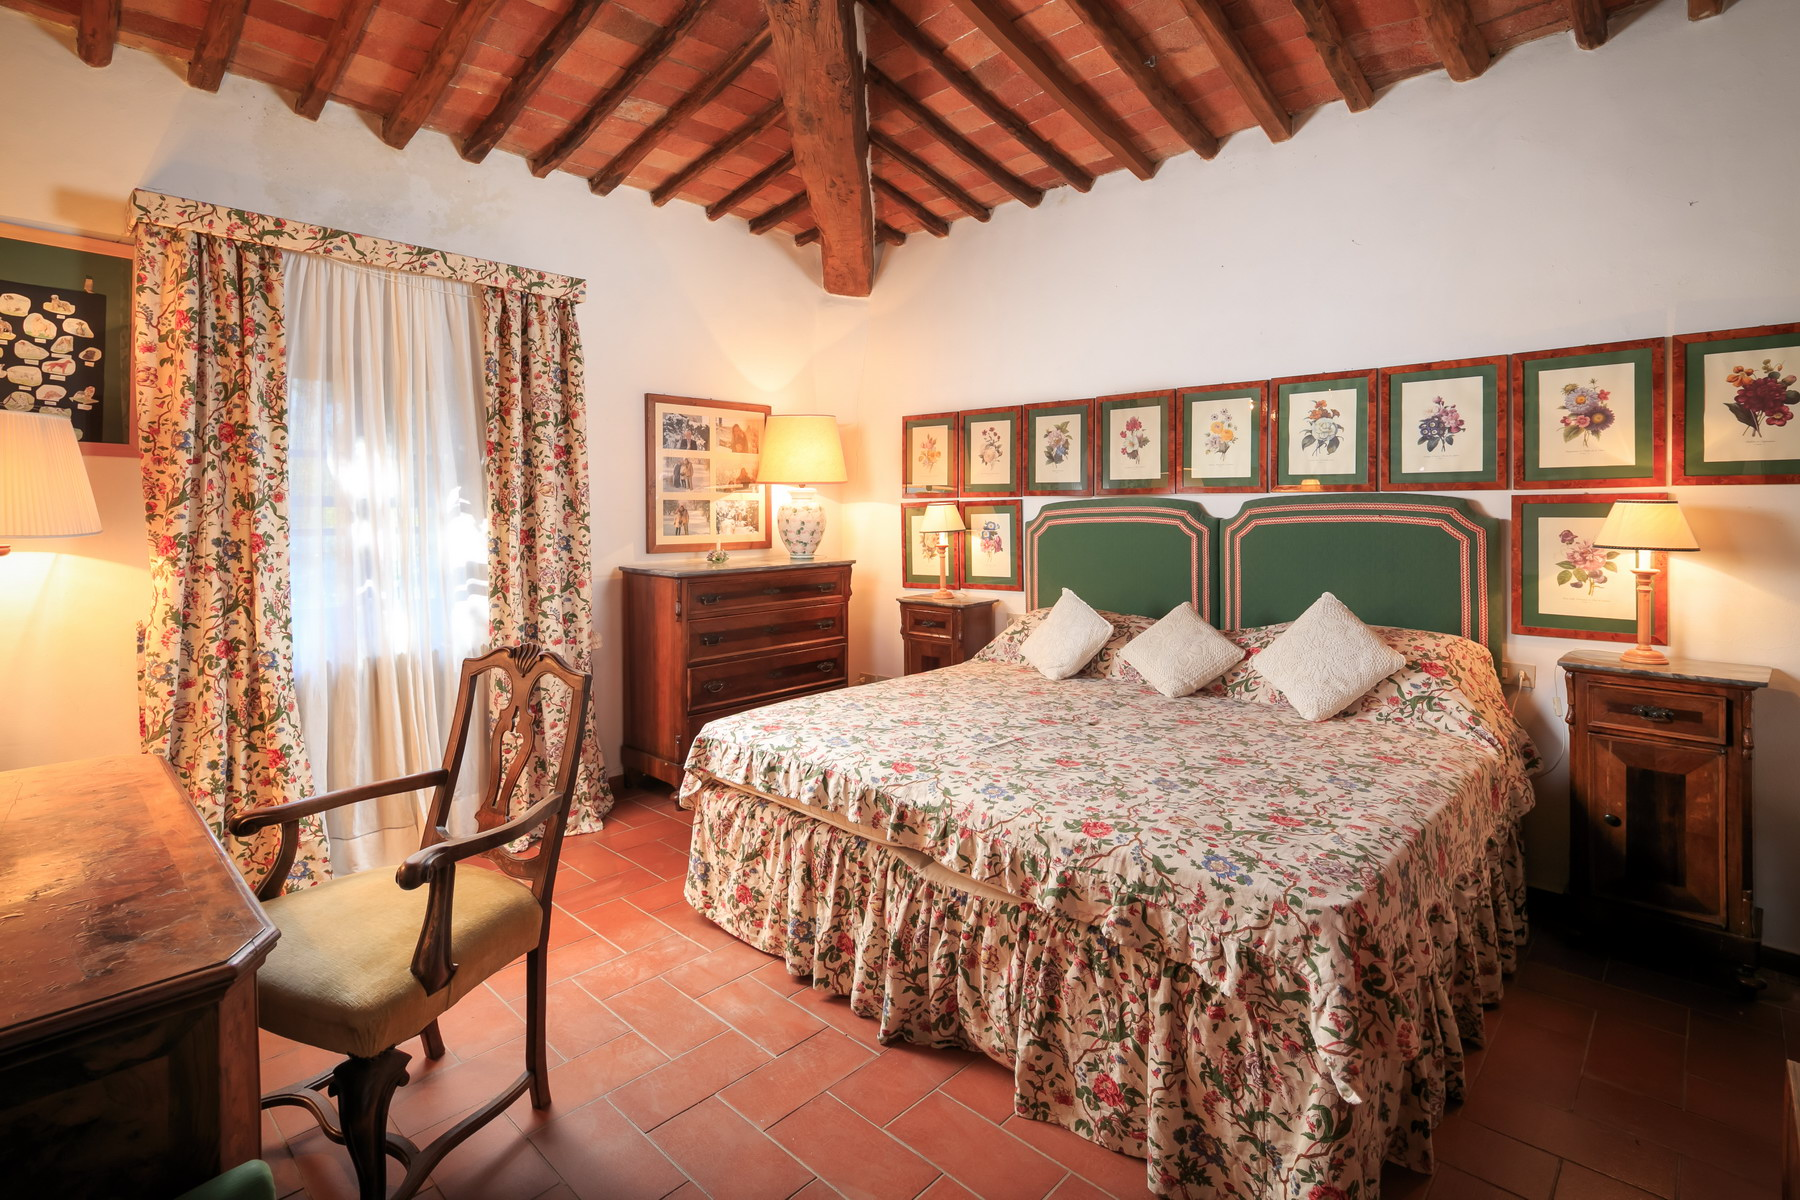 Rustico in Vendita a Castellina In Chianti: 5 locali, 720 mq - Foto 7